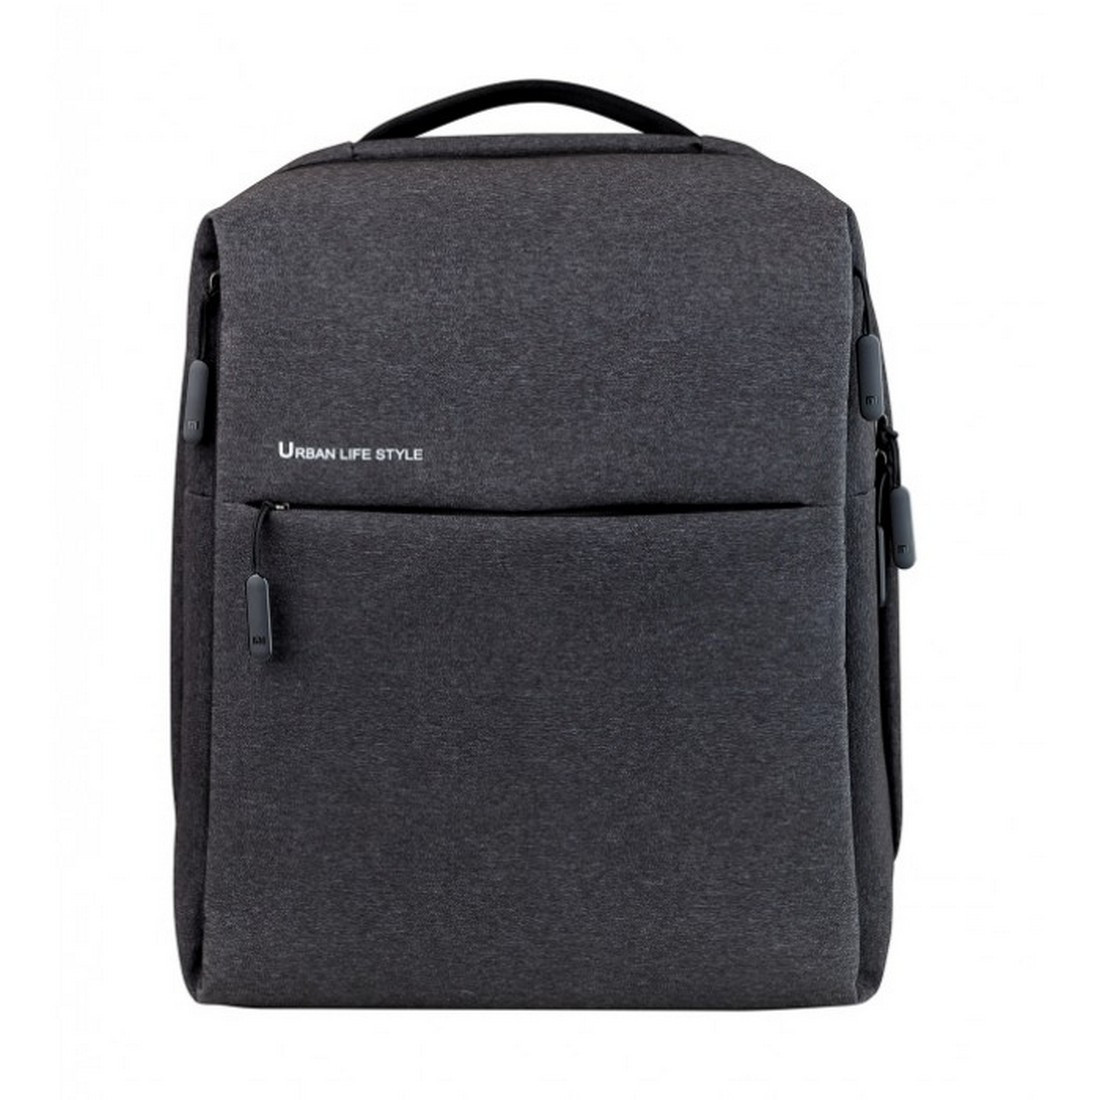 Рюкзак для ноутбука, Xiaomi, Mi City (Urban) Backpack ZTB4027СN/ZJB4067GL, 39*30*14 см